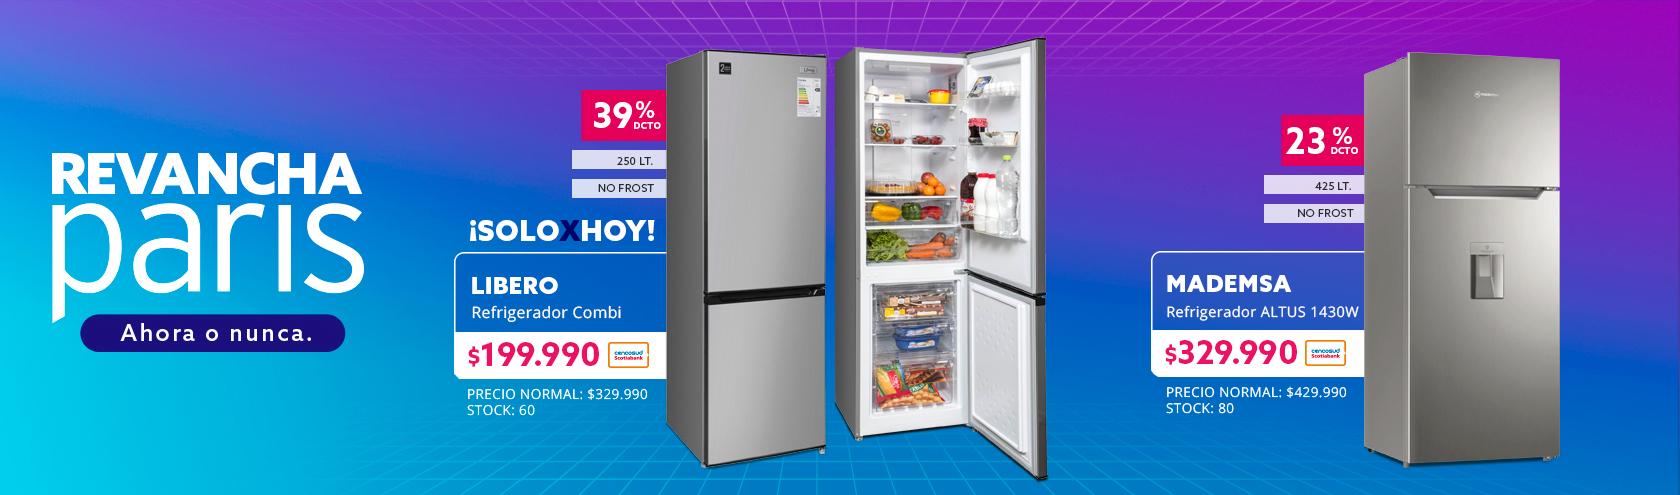 Refrigerador Combi Libero 250 Litros No Frost